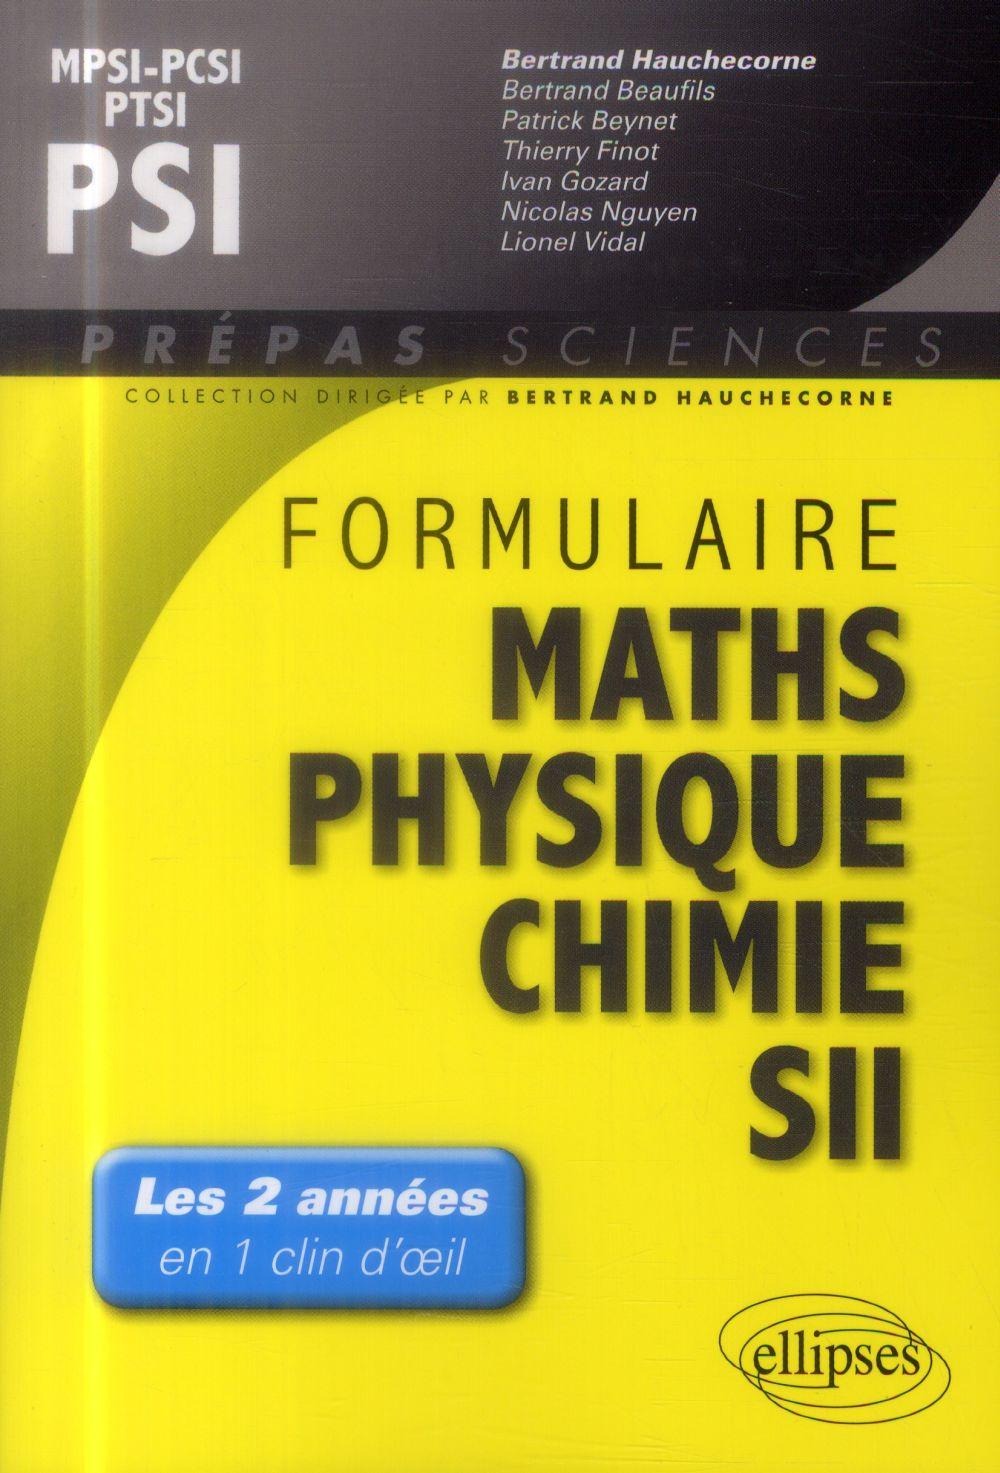 Formulaire : mathematiques - physique-chimie -sii - mpsi-pcsi-ptsi / psi